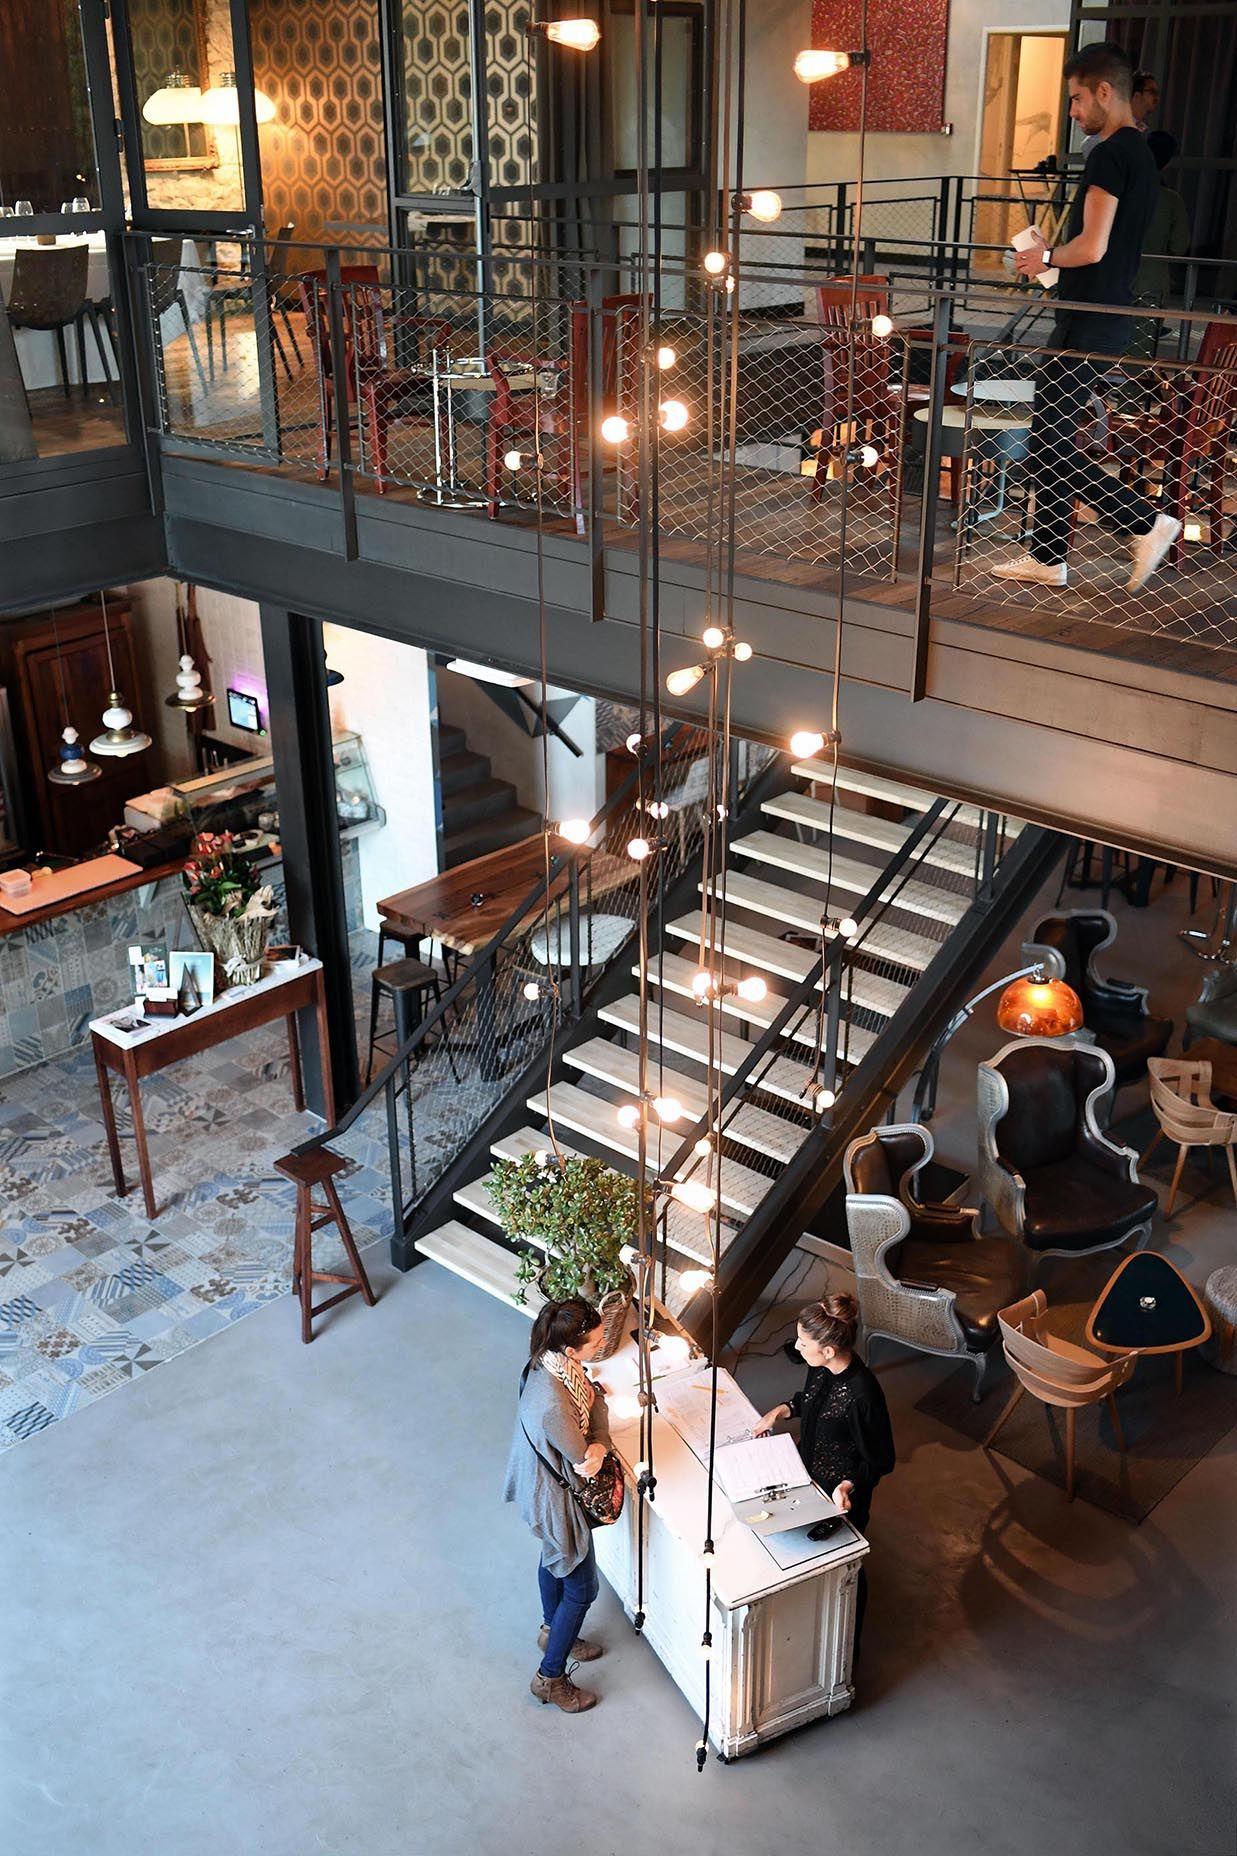 Restaurant Decoration Beton Carreaudeciment Bartapas Passerelle Guirlandelumineuse Tapisserie Design Mobilier Bar A Tapas Design Restaurant